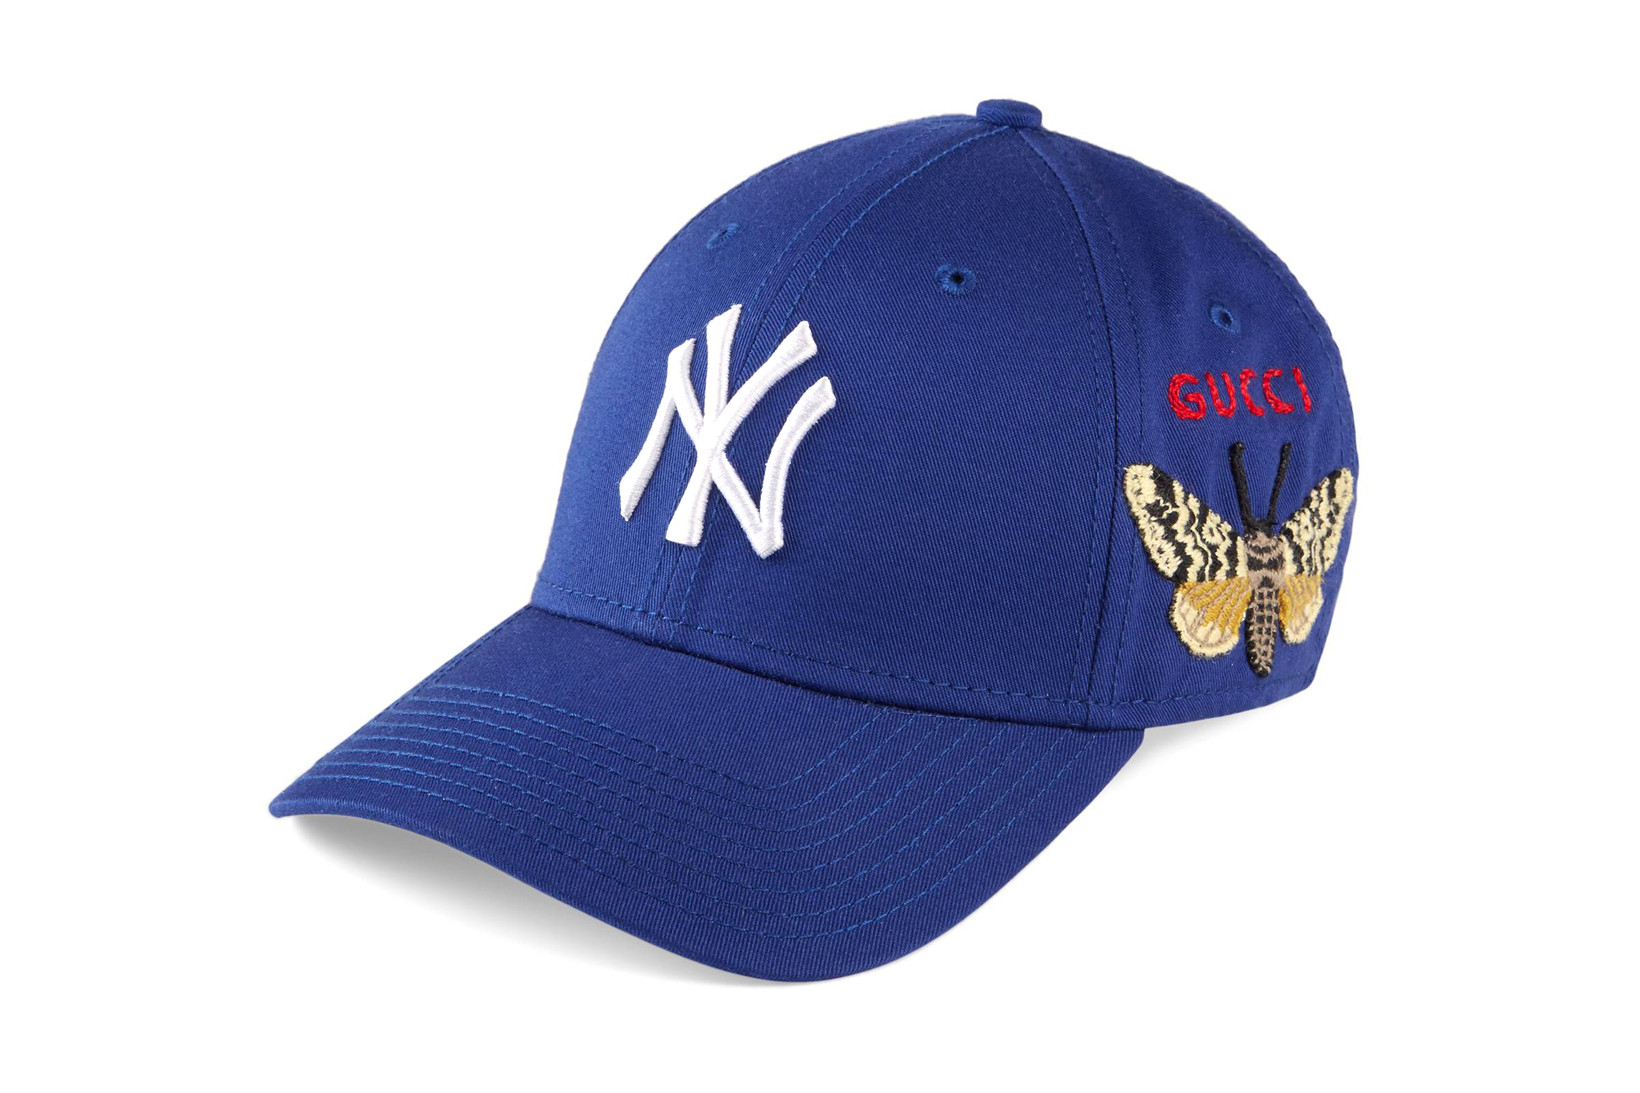 1b970ac8368db New York Yankees Gucci Shoes